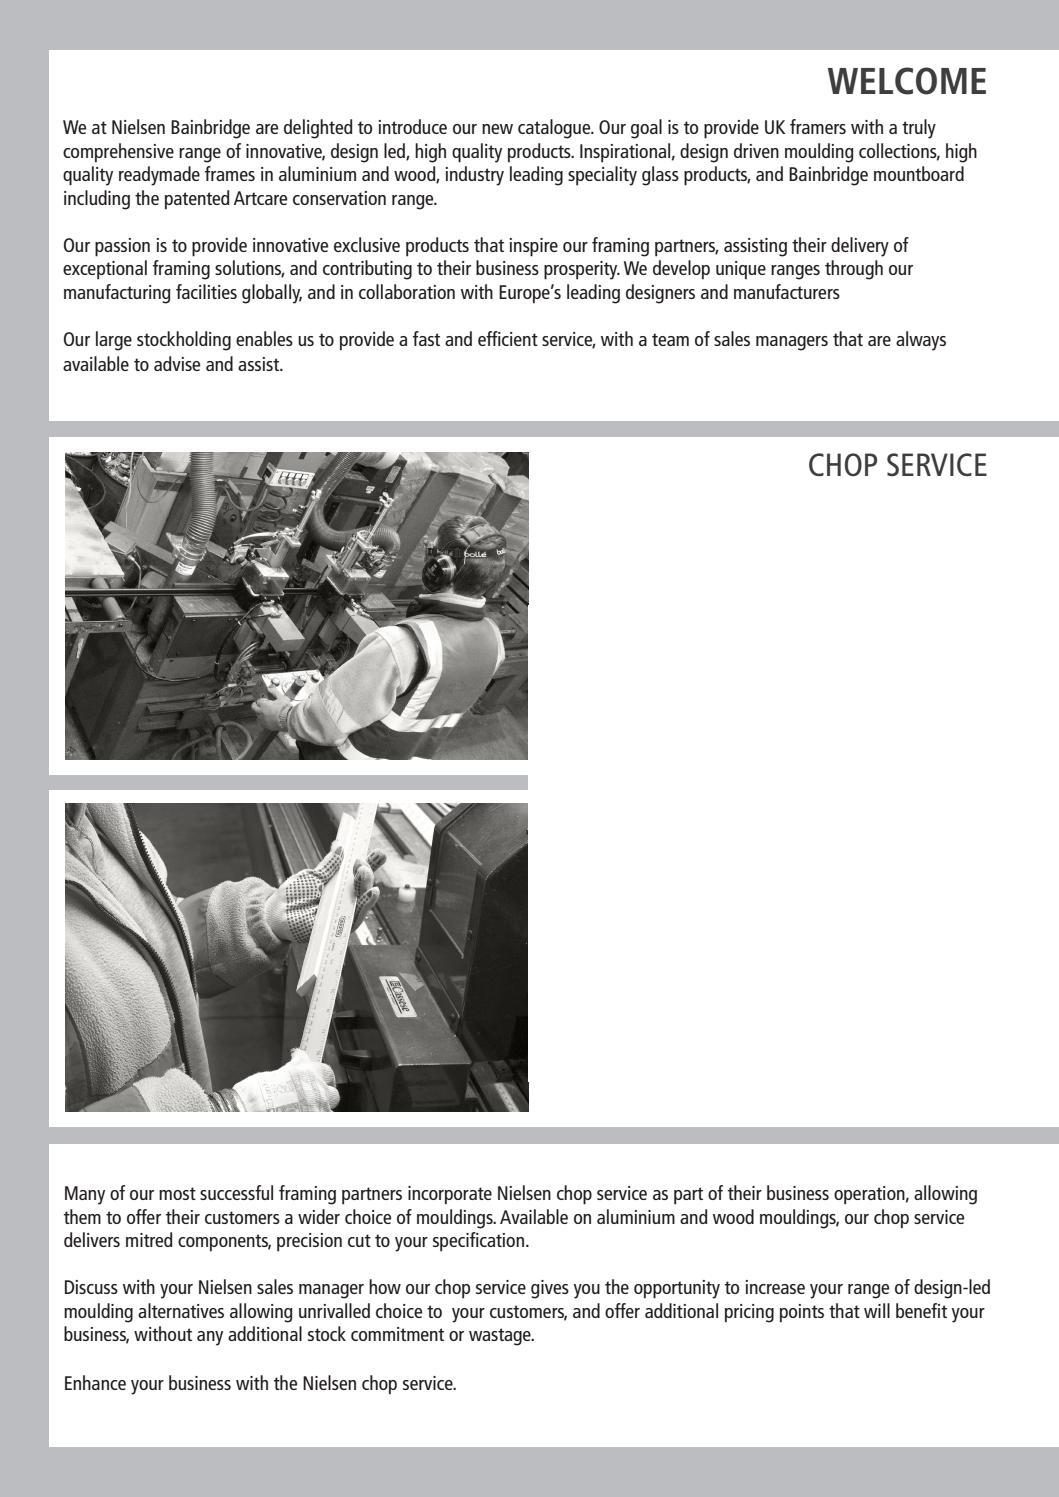 Nielsen Bainbridge - Professional Framing Products Catalogue - Feb